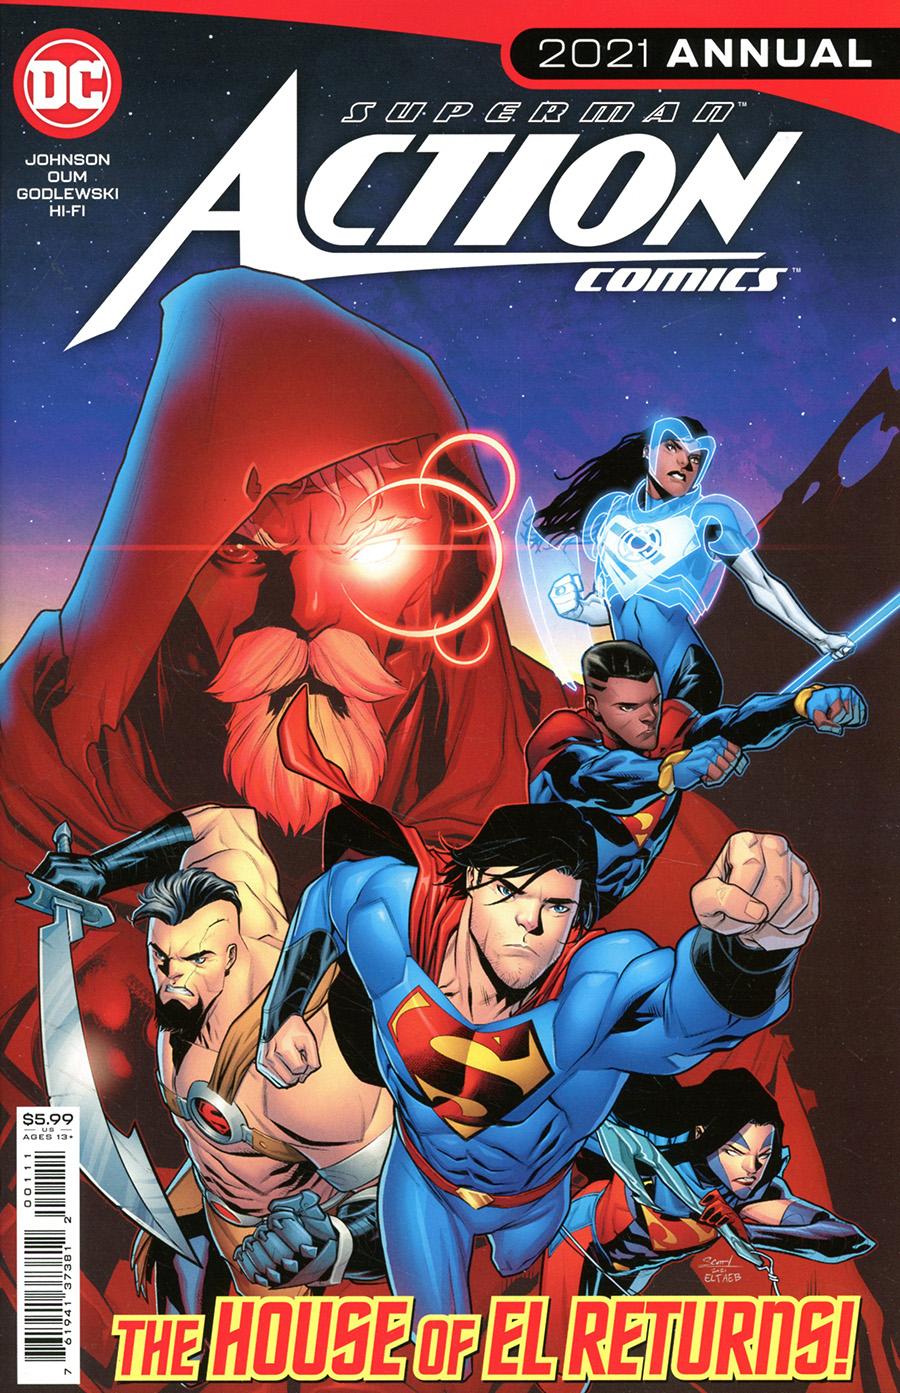 Action Comics Vol 2 Annual 2021 #1 Cover A Regular Scott Godlewski Cover